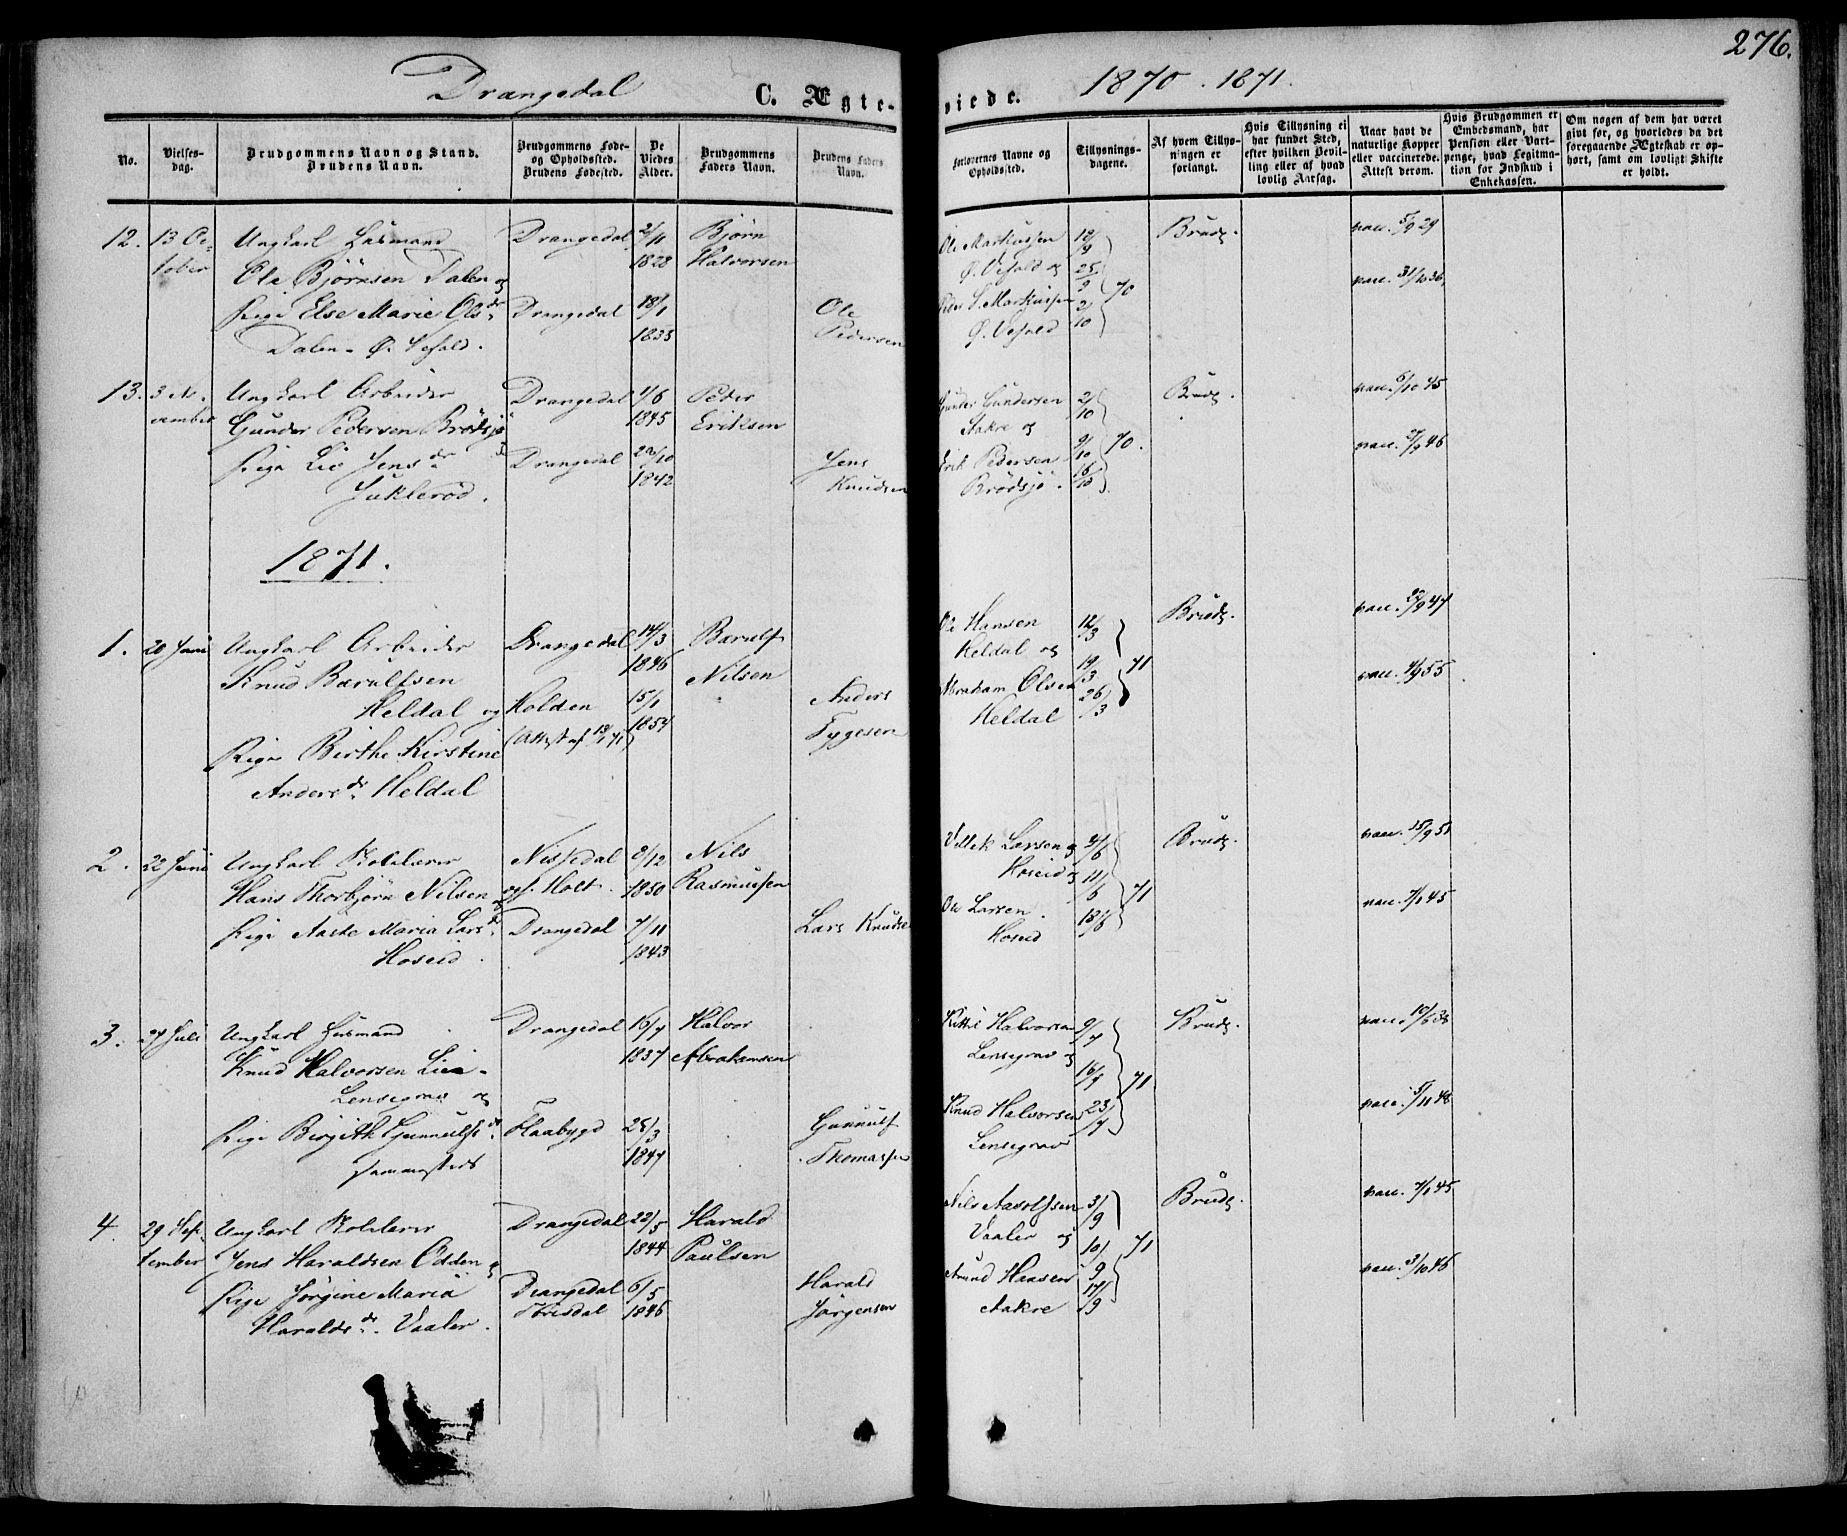 SAKO, Drangedal kirkebøker, F/Fa/L0008: Ministerialbok nr. 8, 1857-1871, s. 276